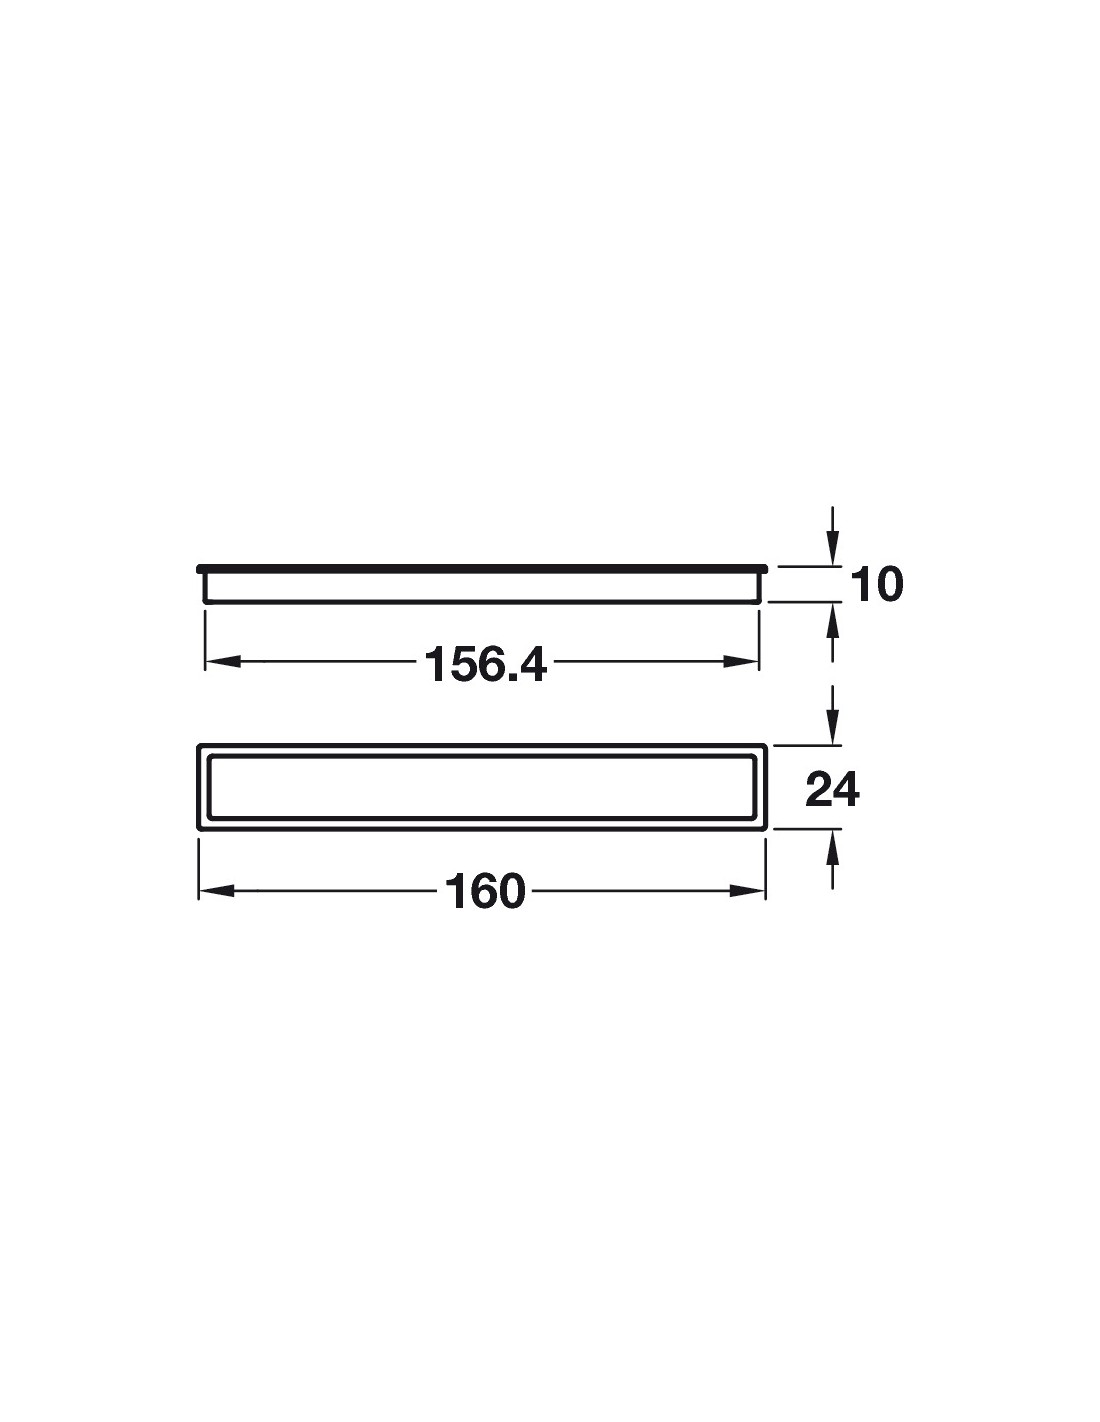 White Inset Door Handle 160mm Length The Cubic Modrrn